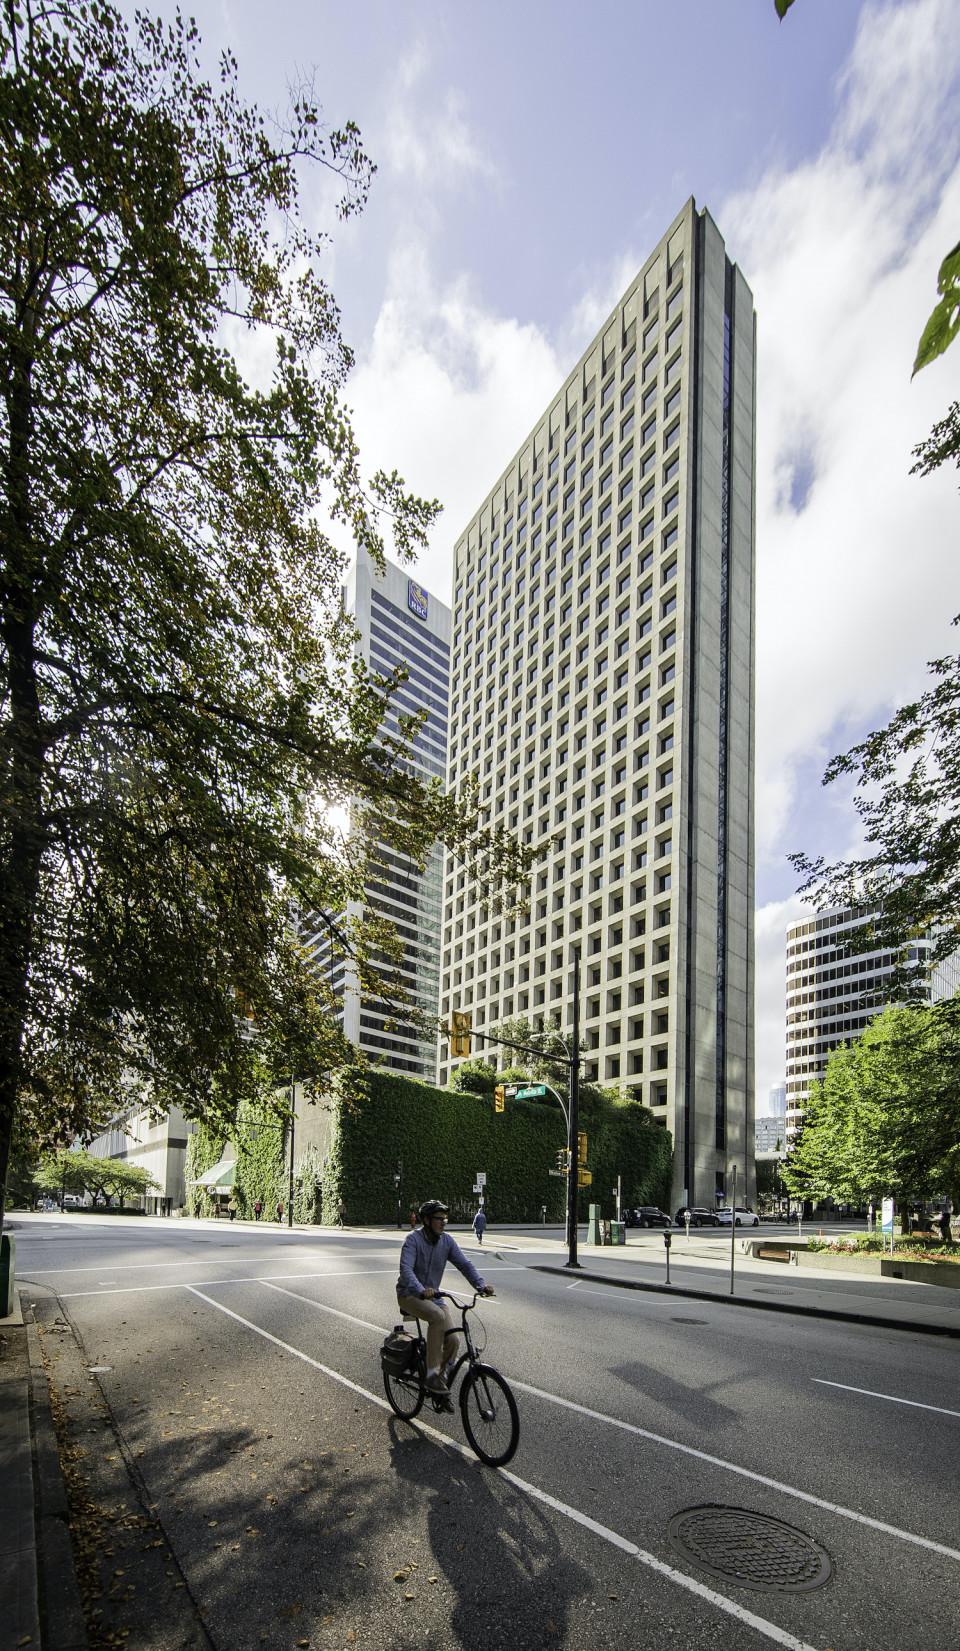 Arthur Erickson Place as seen from Melville Street bike lane